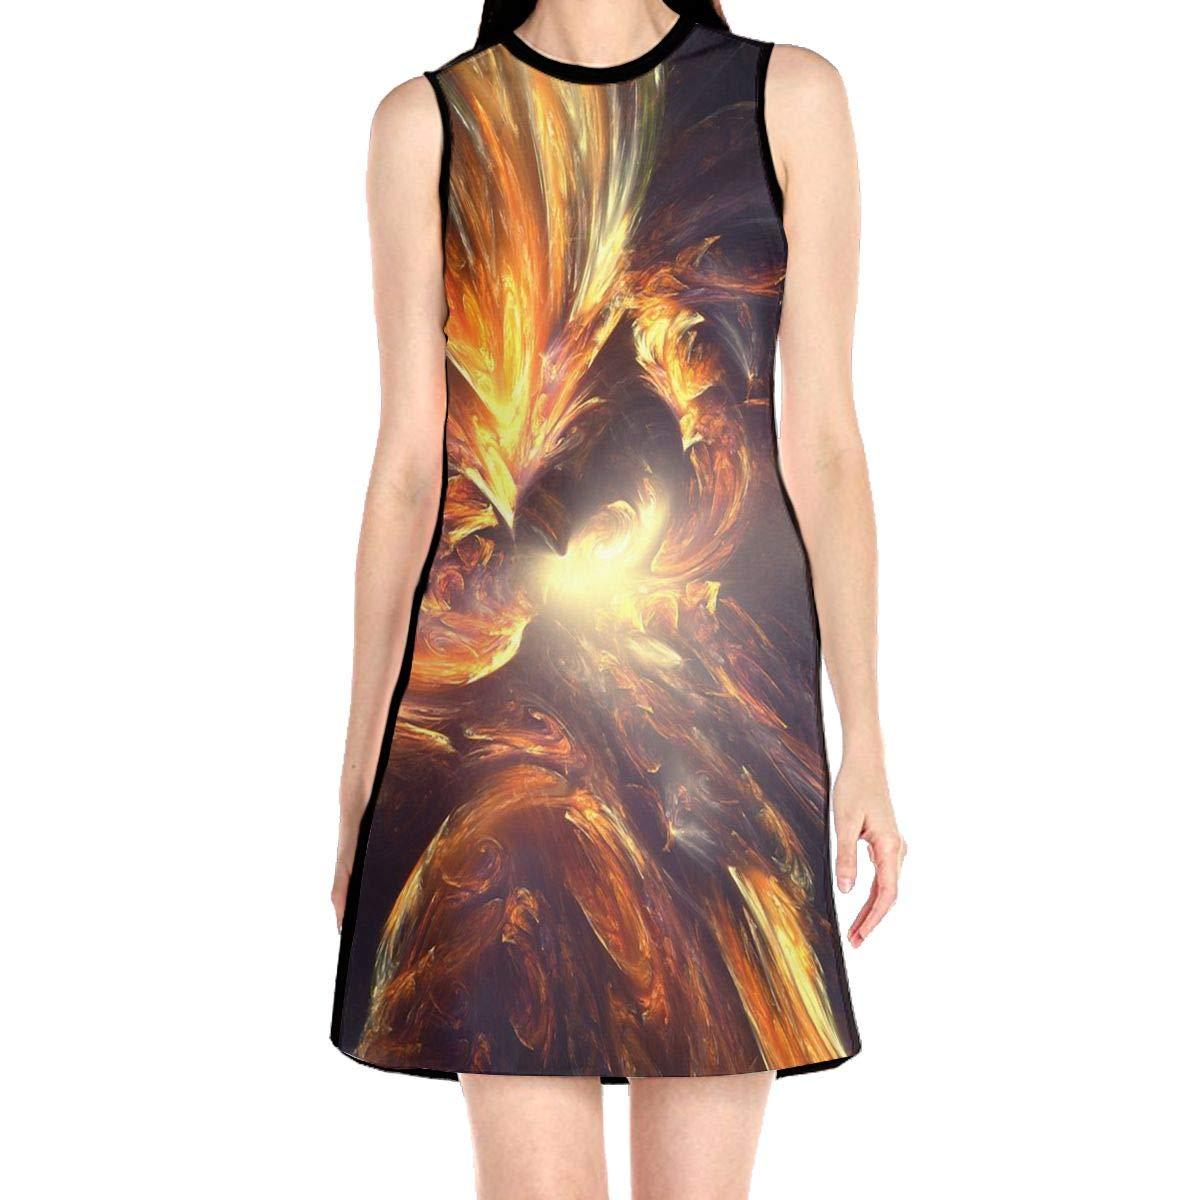 Serious Tiger Women Causal Sleeveless Dress Loose Mini T-Shirt Dress